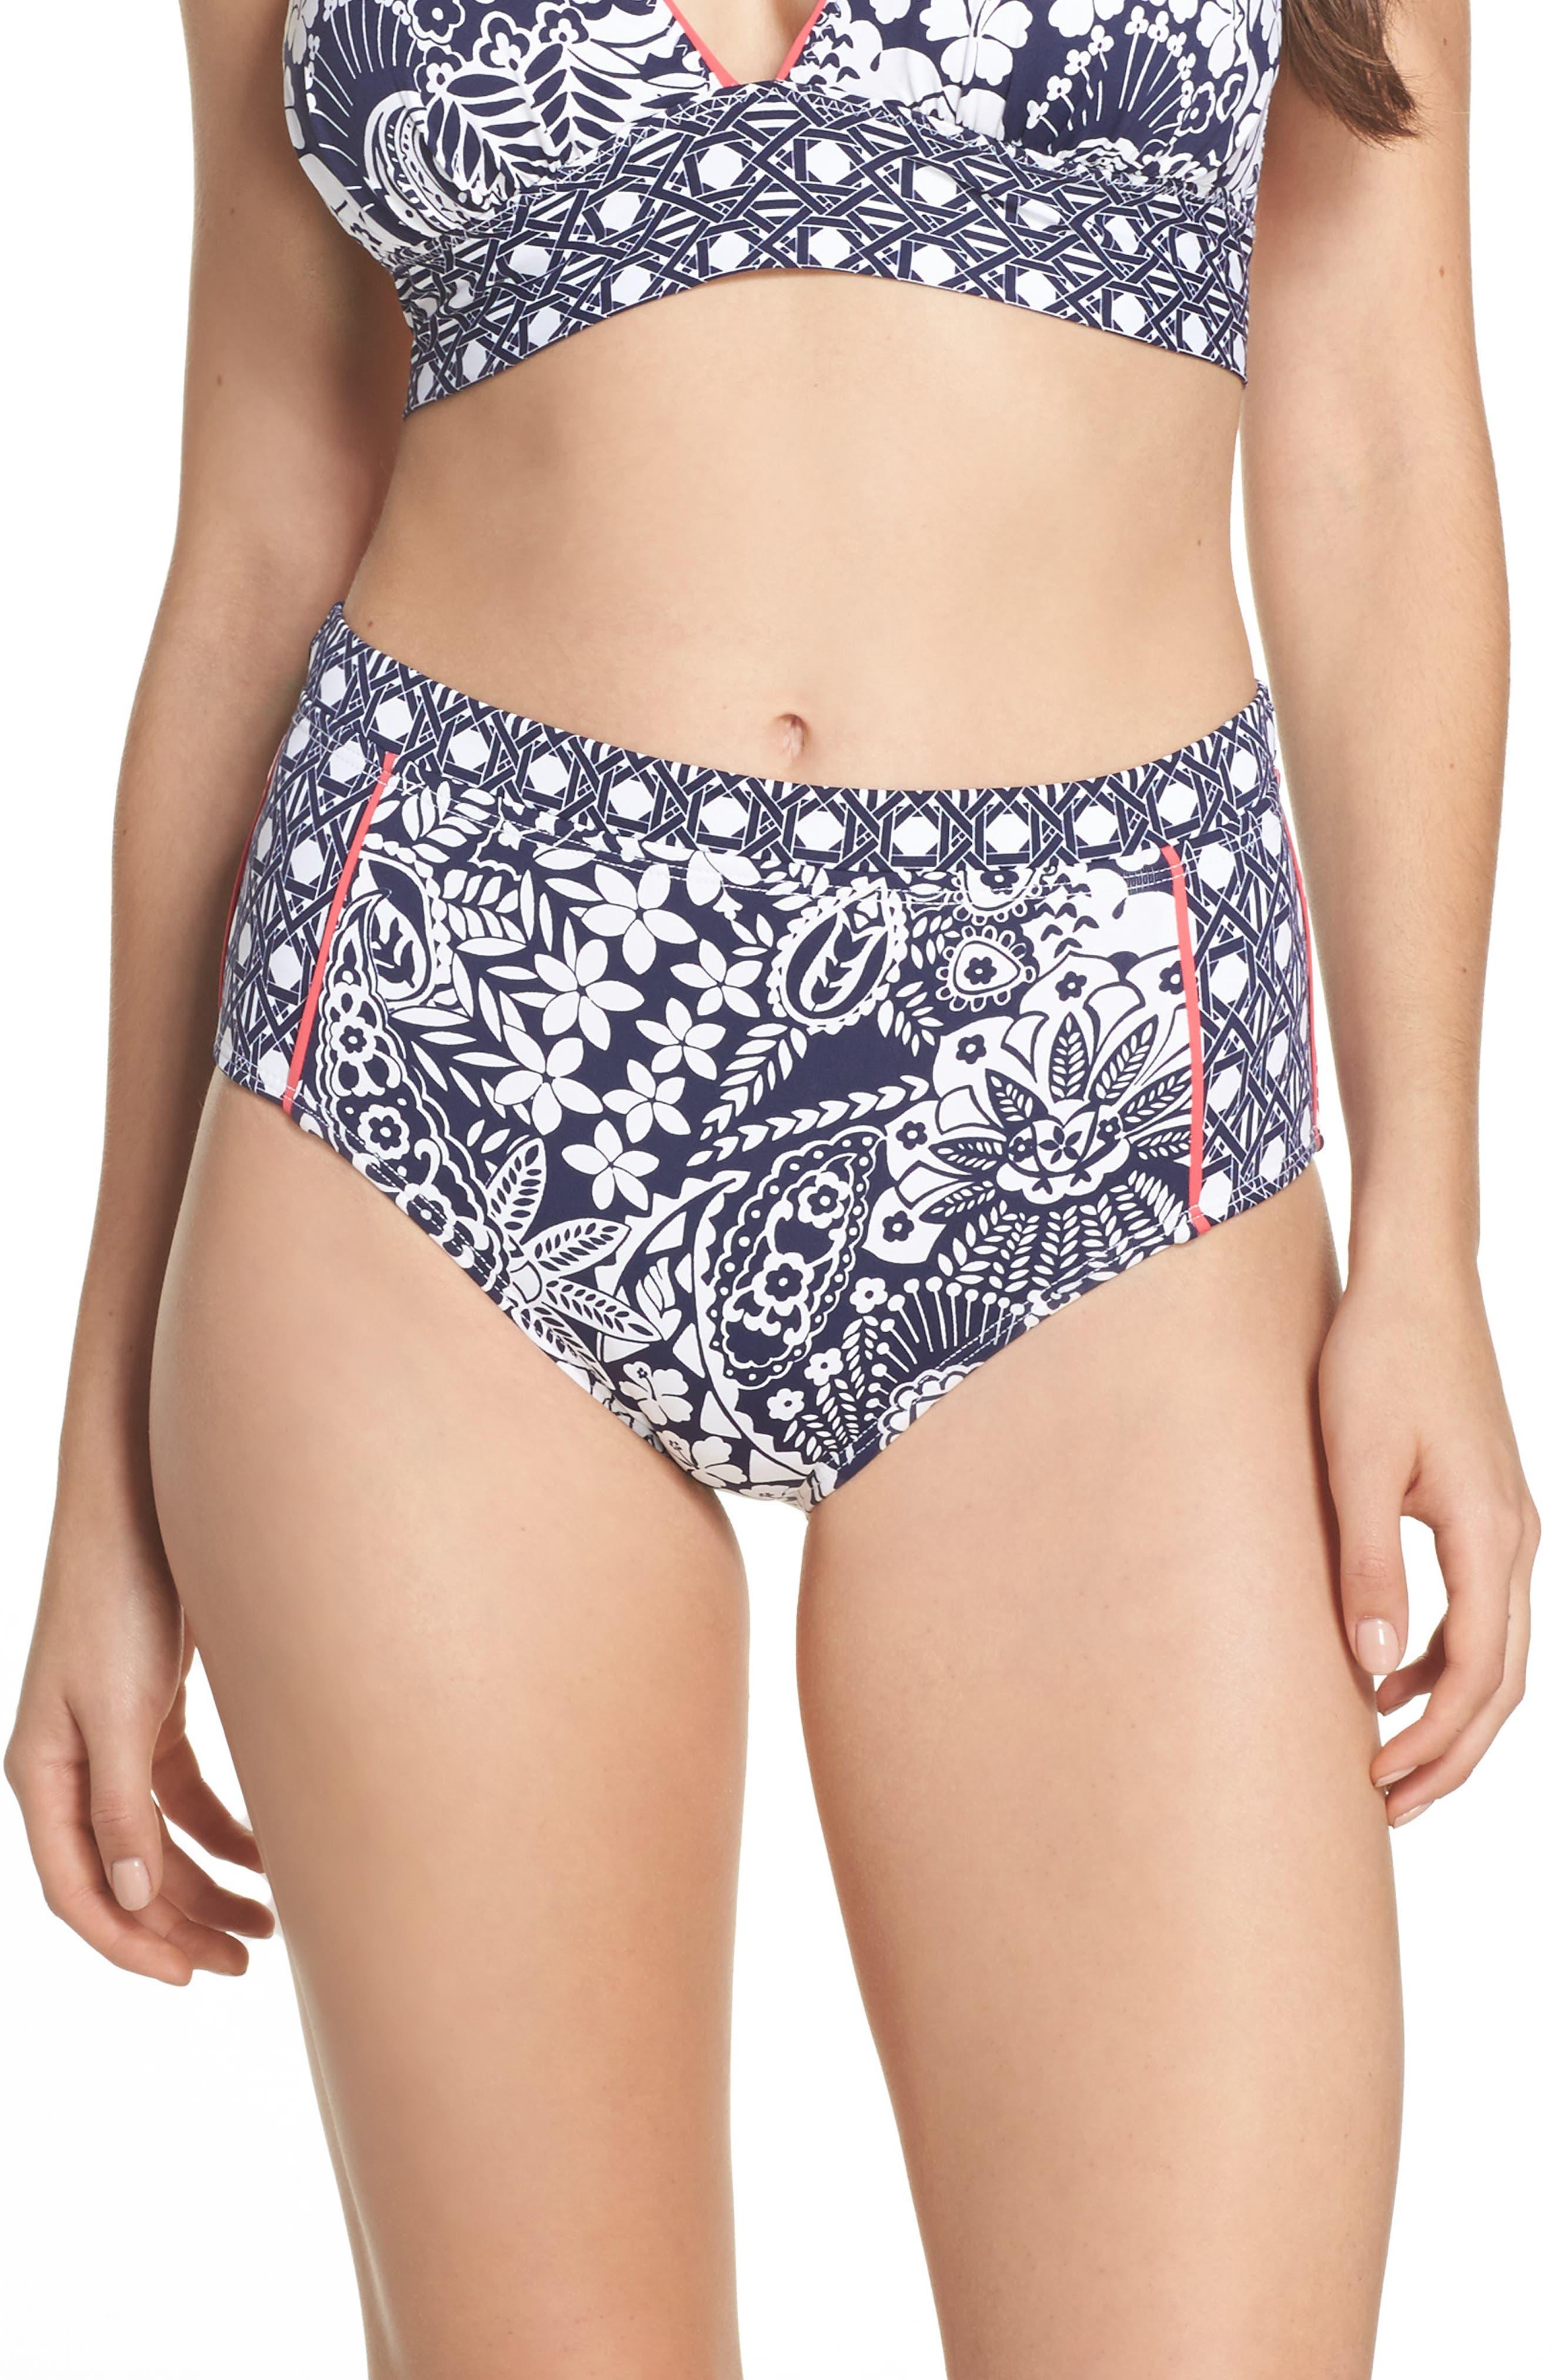 Paisley Paradise High Waist Bikini Bottoms,                         Main,                         color, Mare Navy